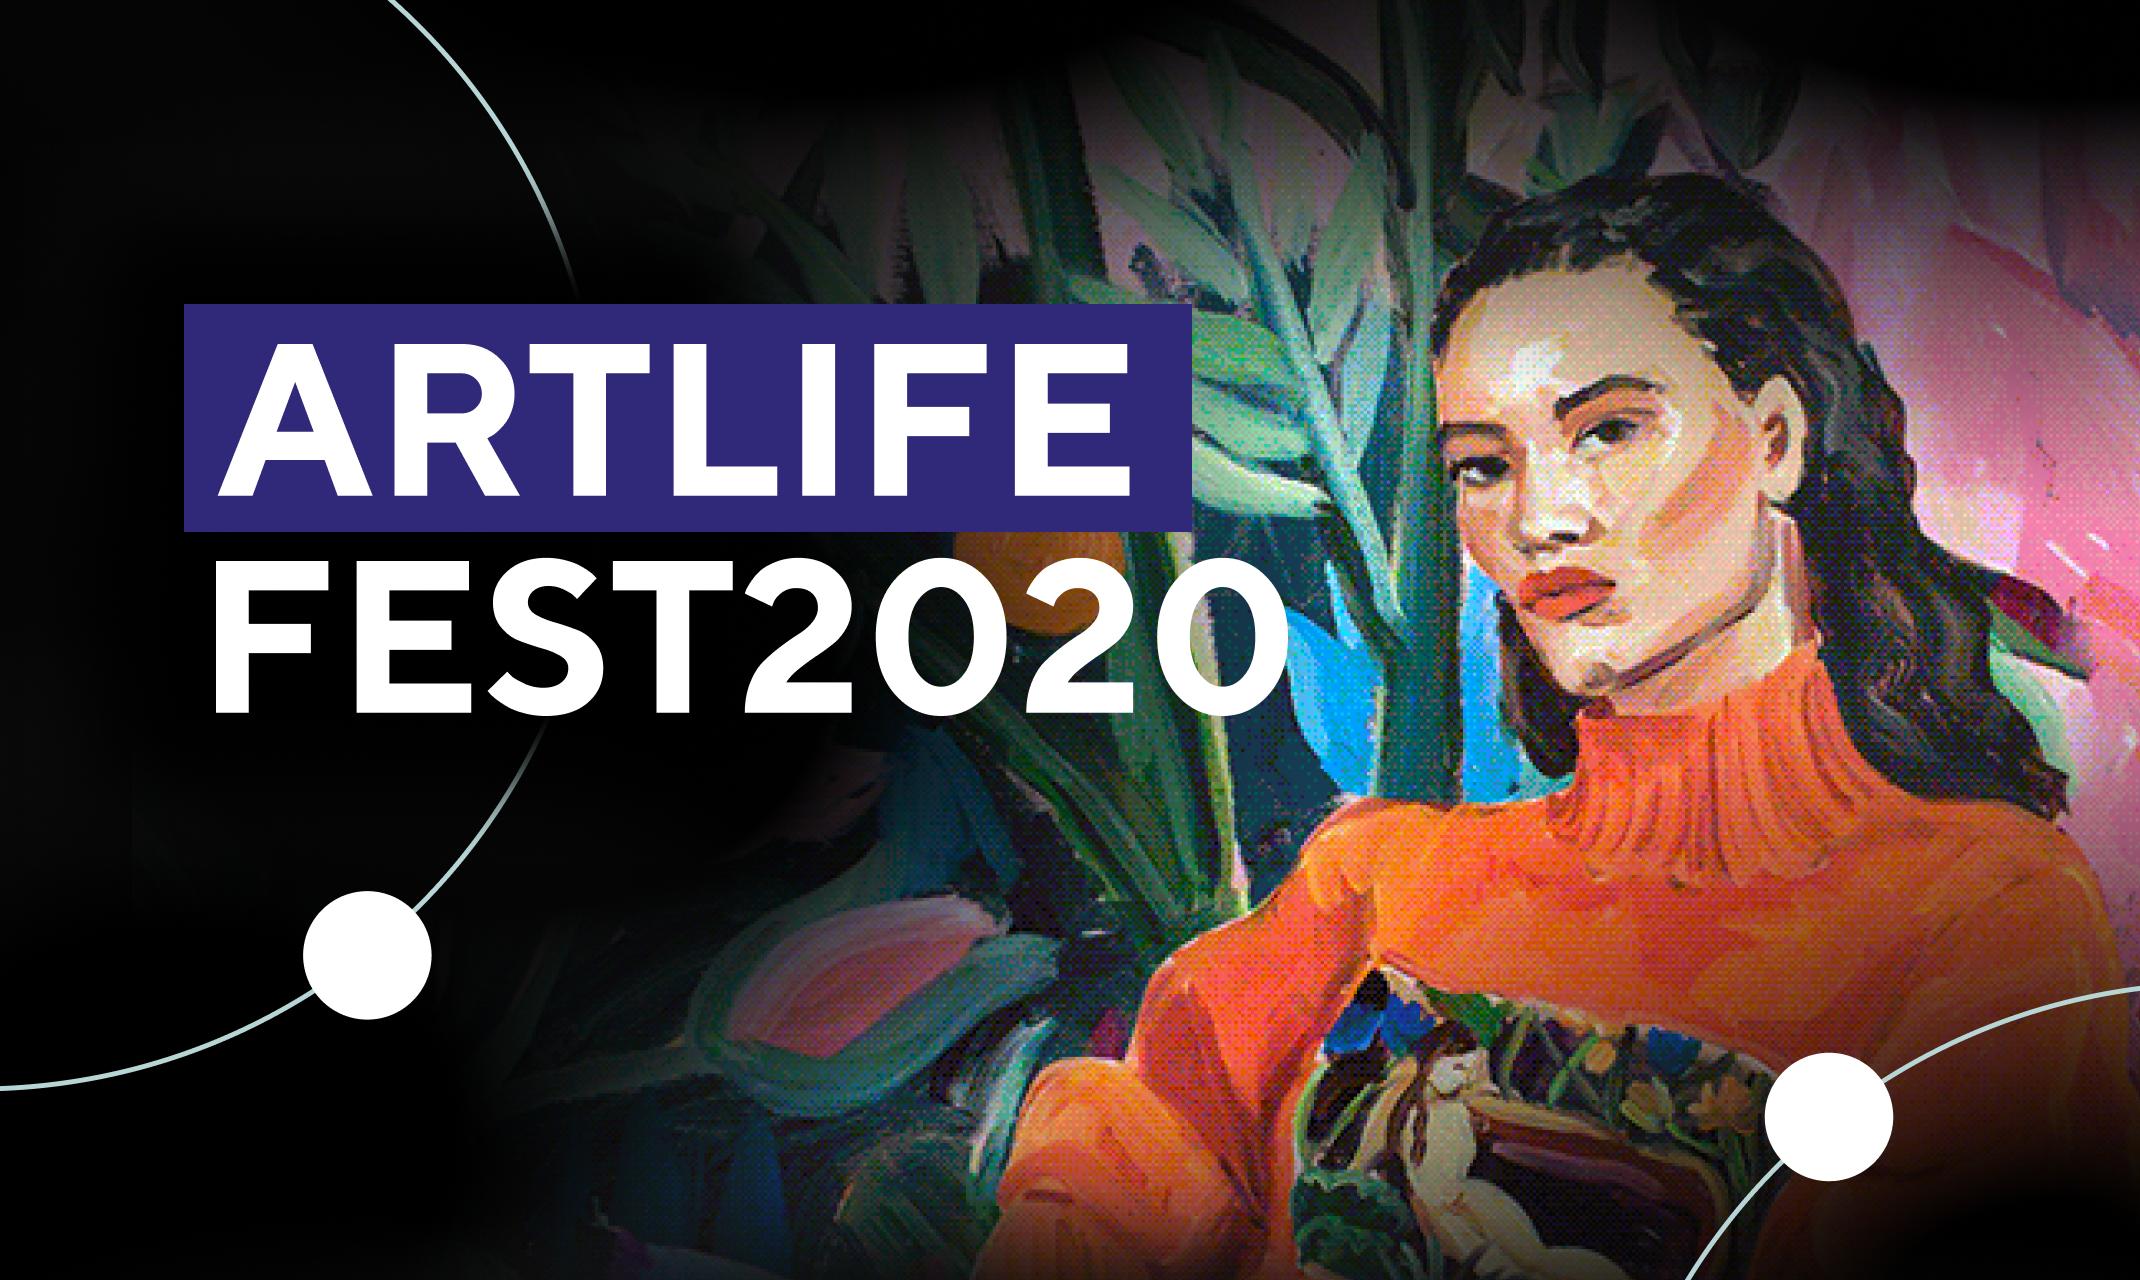 ARTLIFE 2020